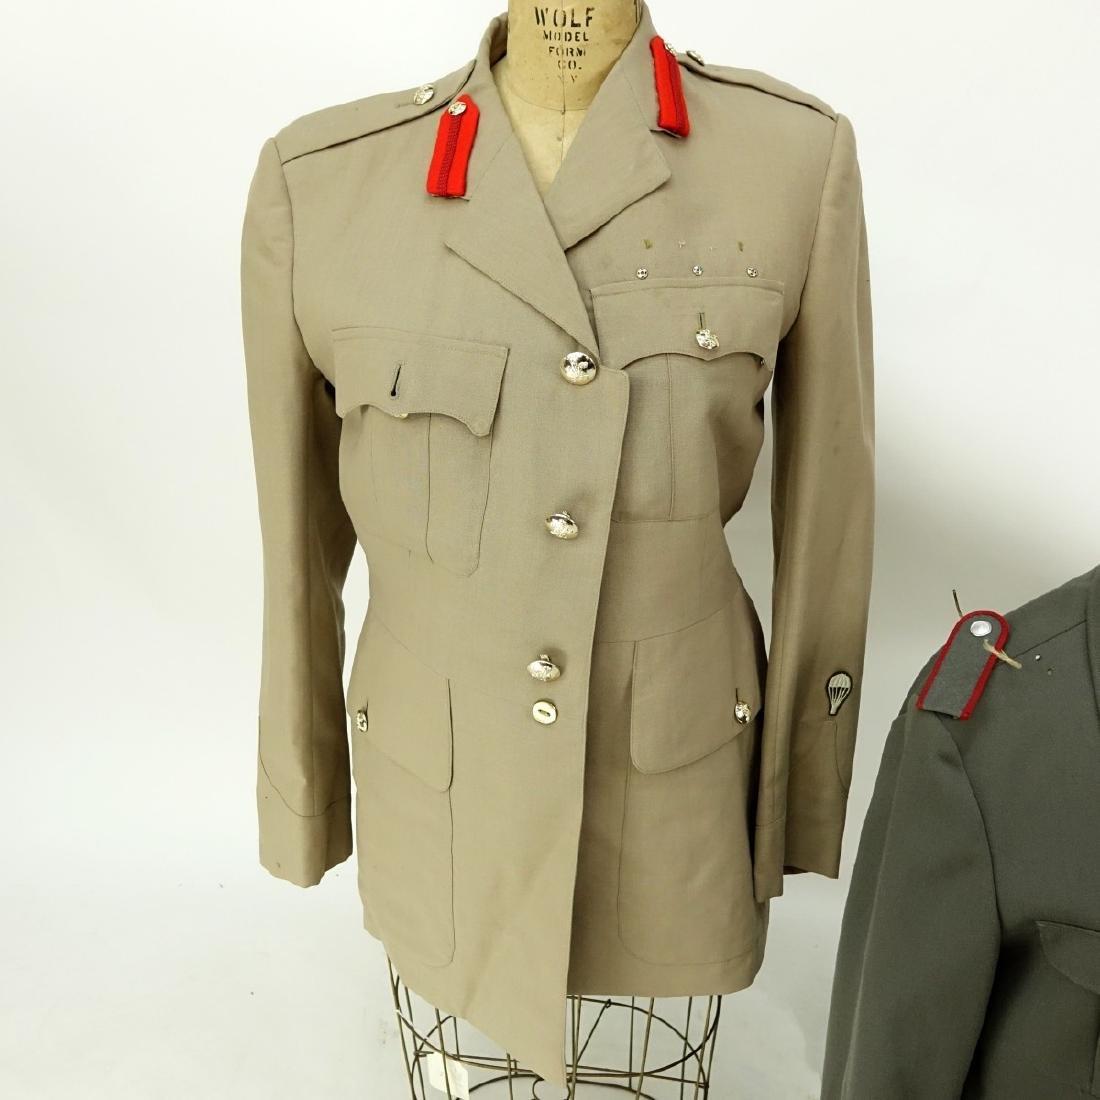 Military Uniforms - 3